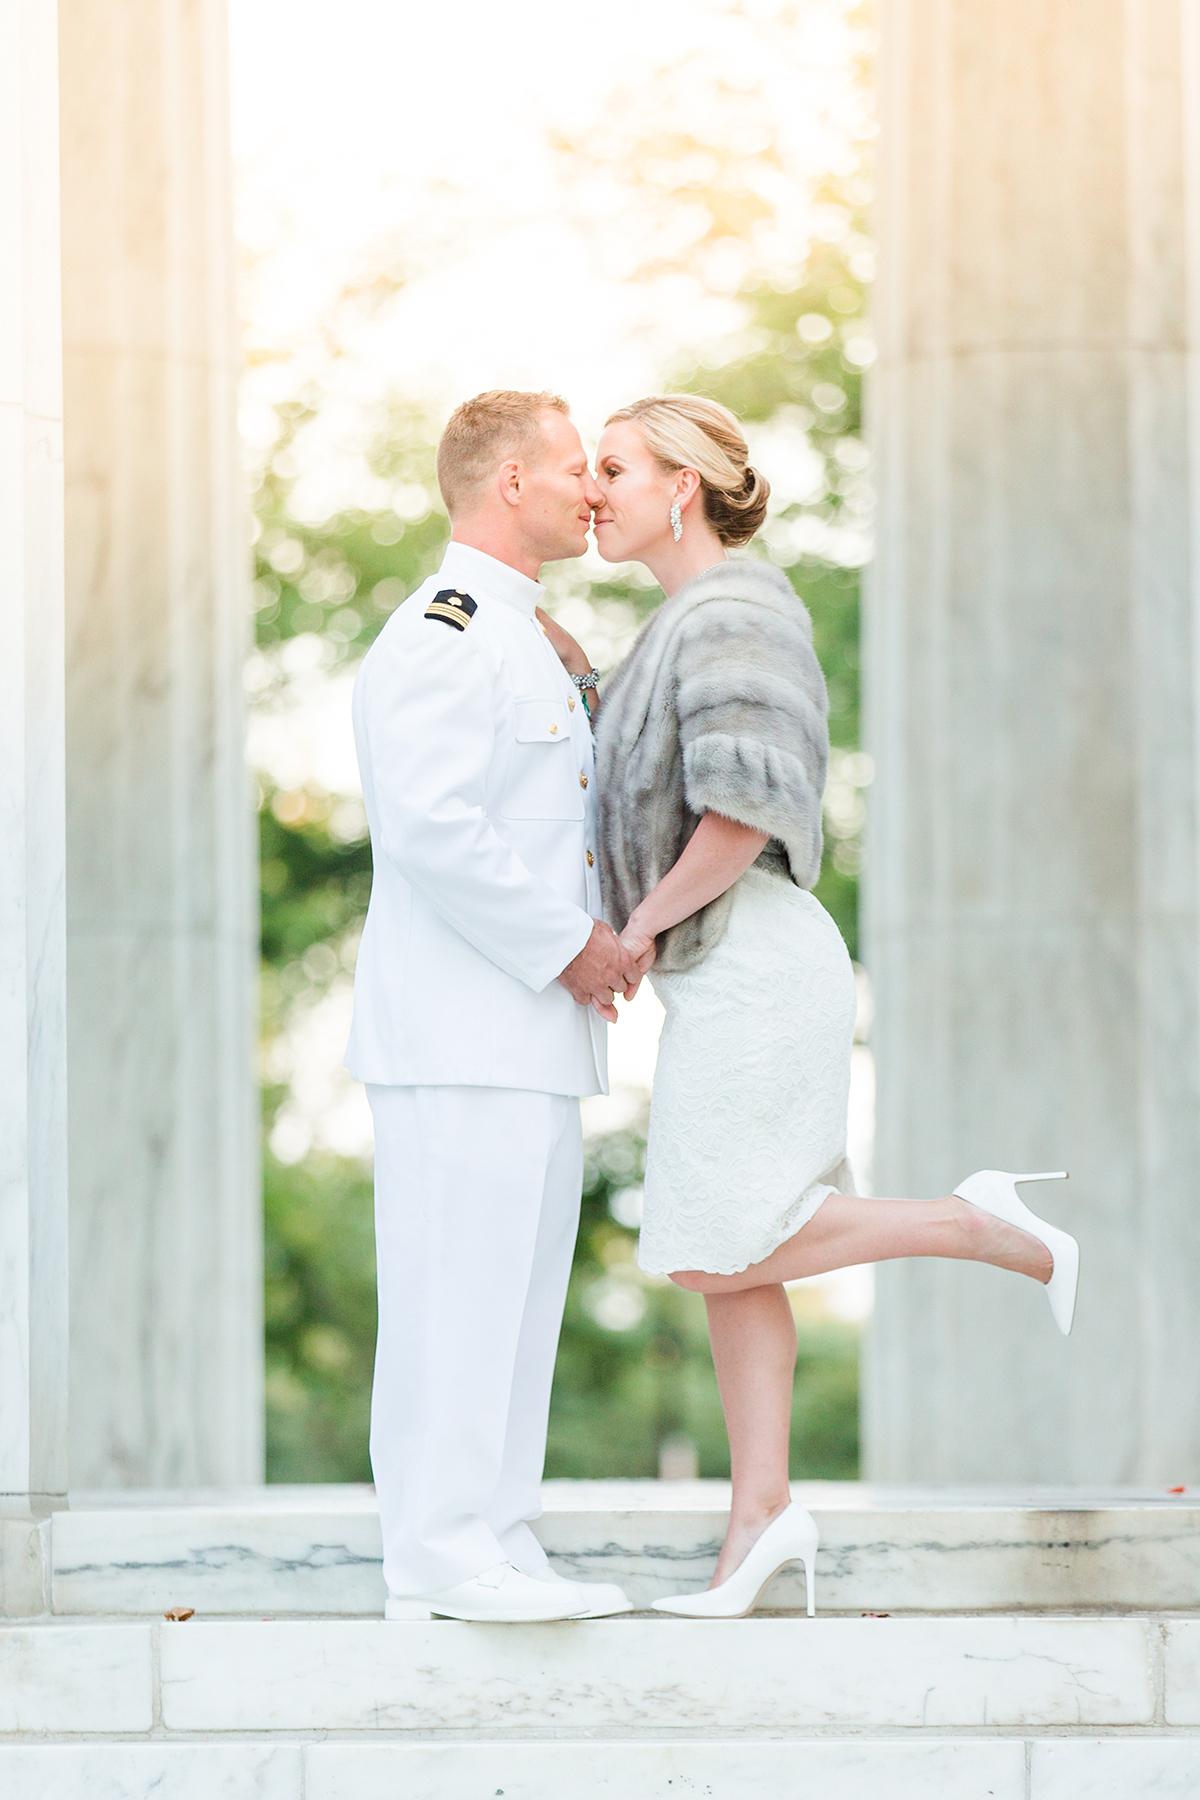 Intimate-Military-Elopement-bride-in-wrap.jpg